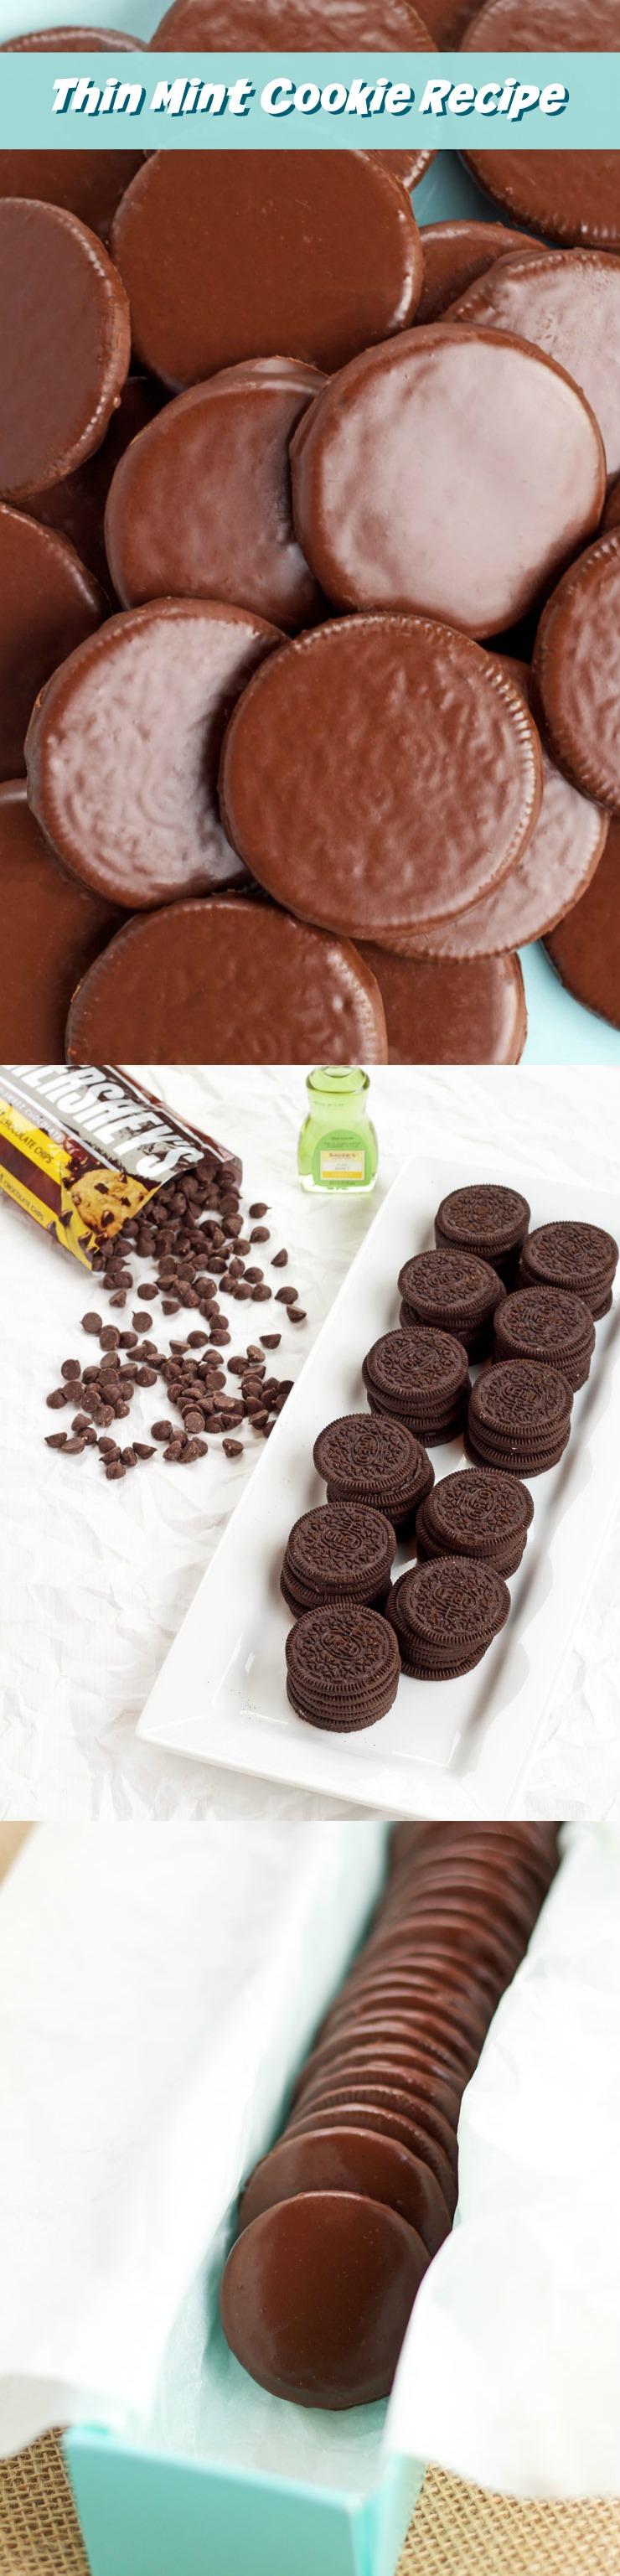 Thin Mint Cookie Recipe The Bearfoot Baker